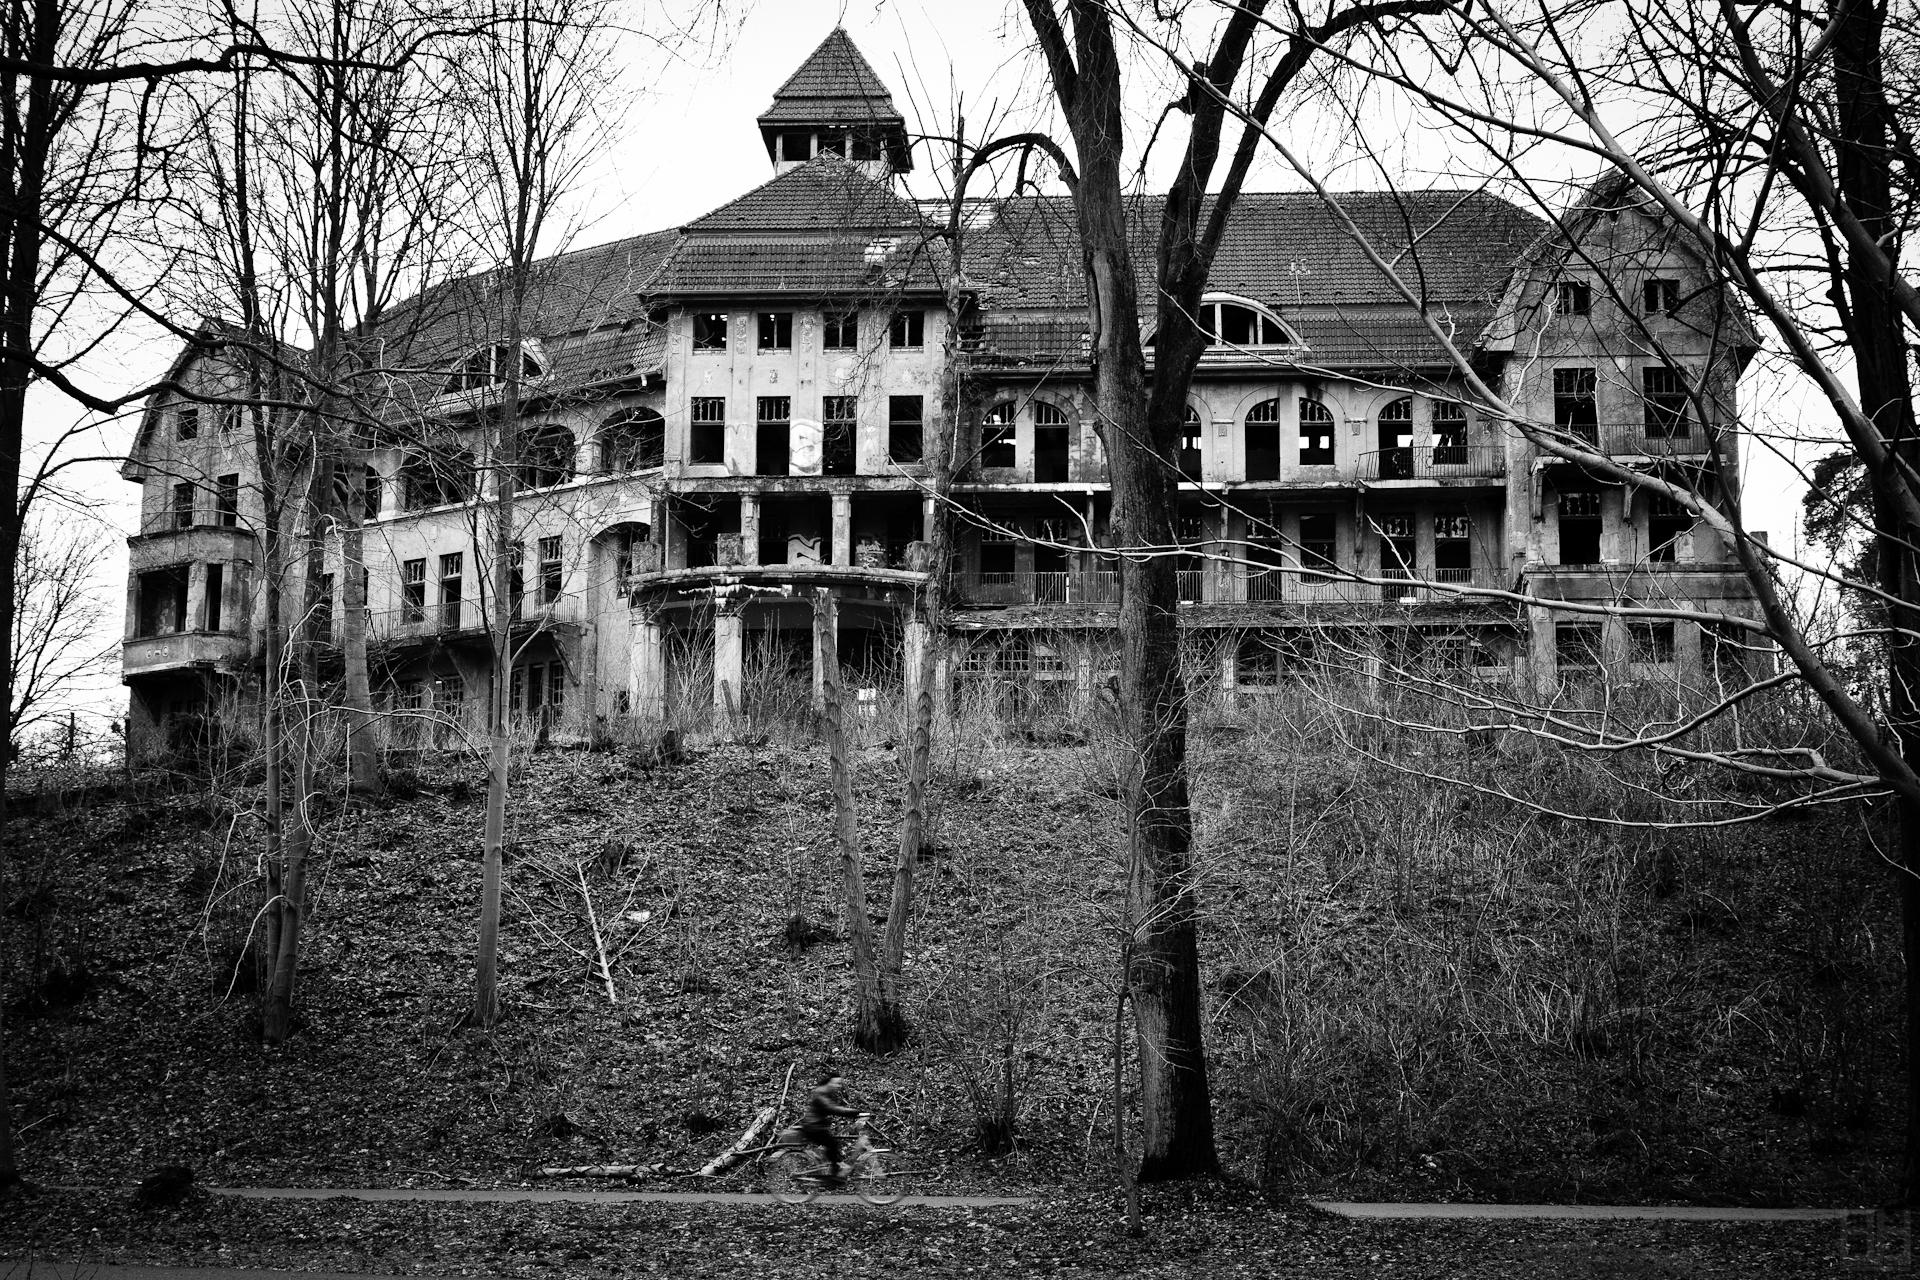 The Haunted House Das Geisterhaus